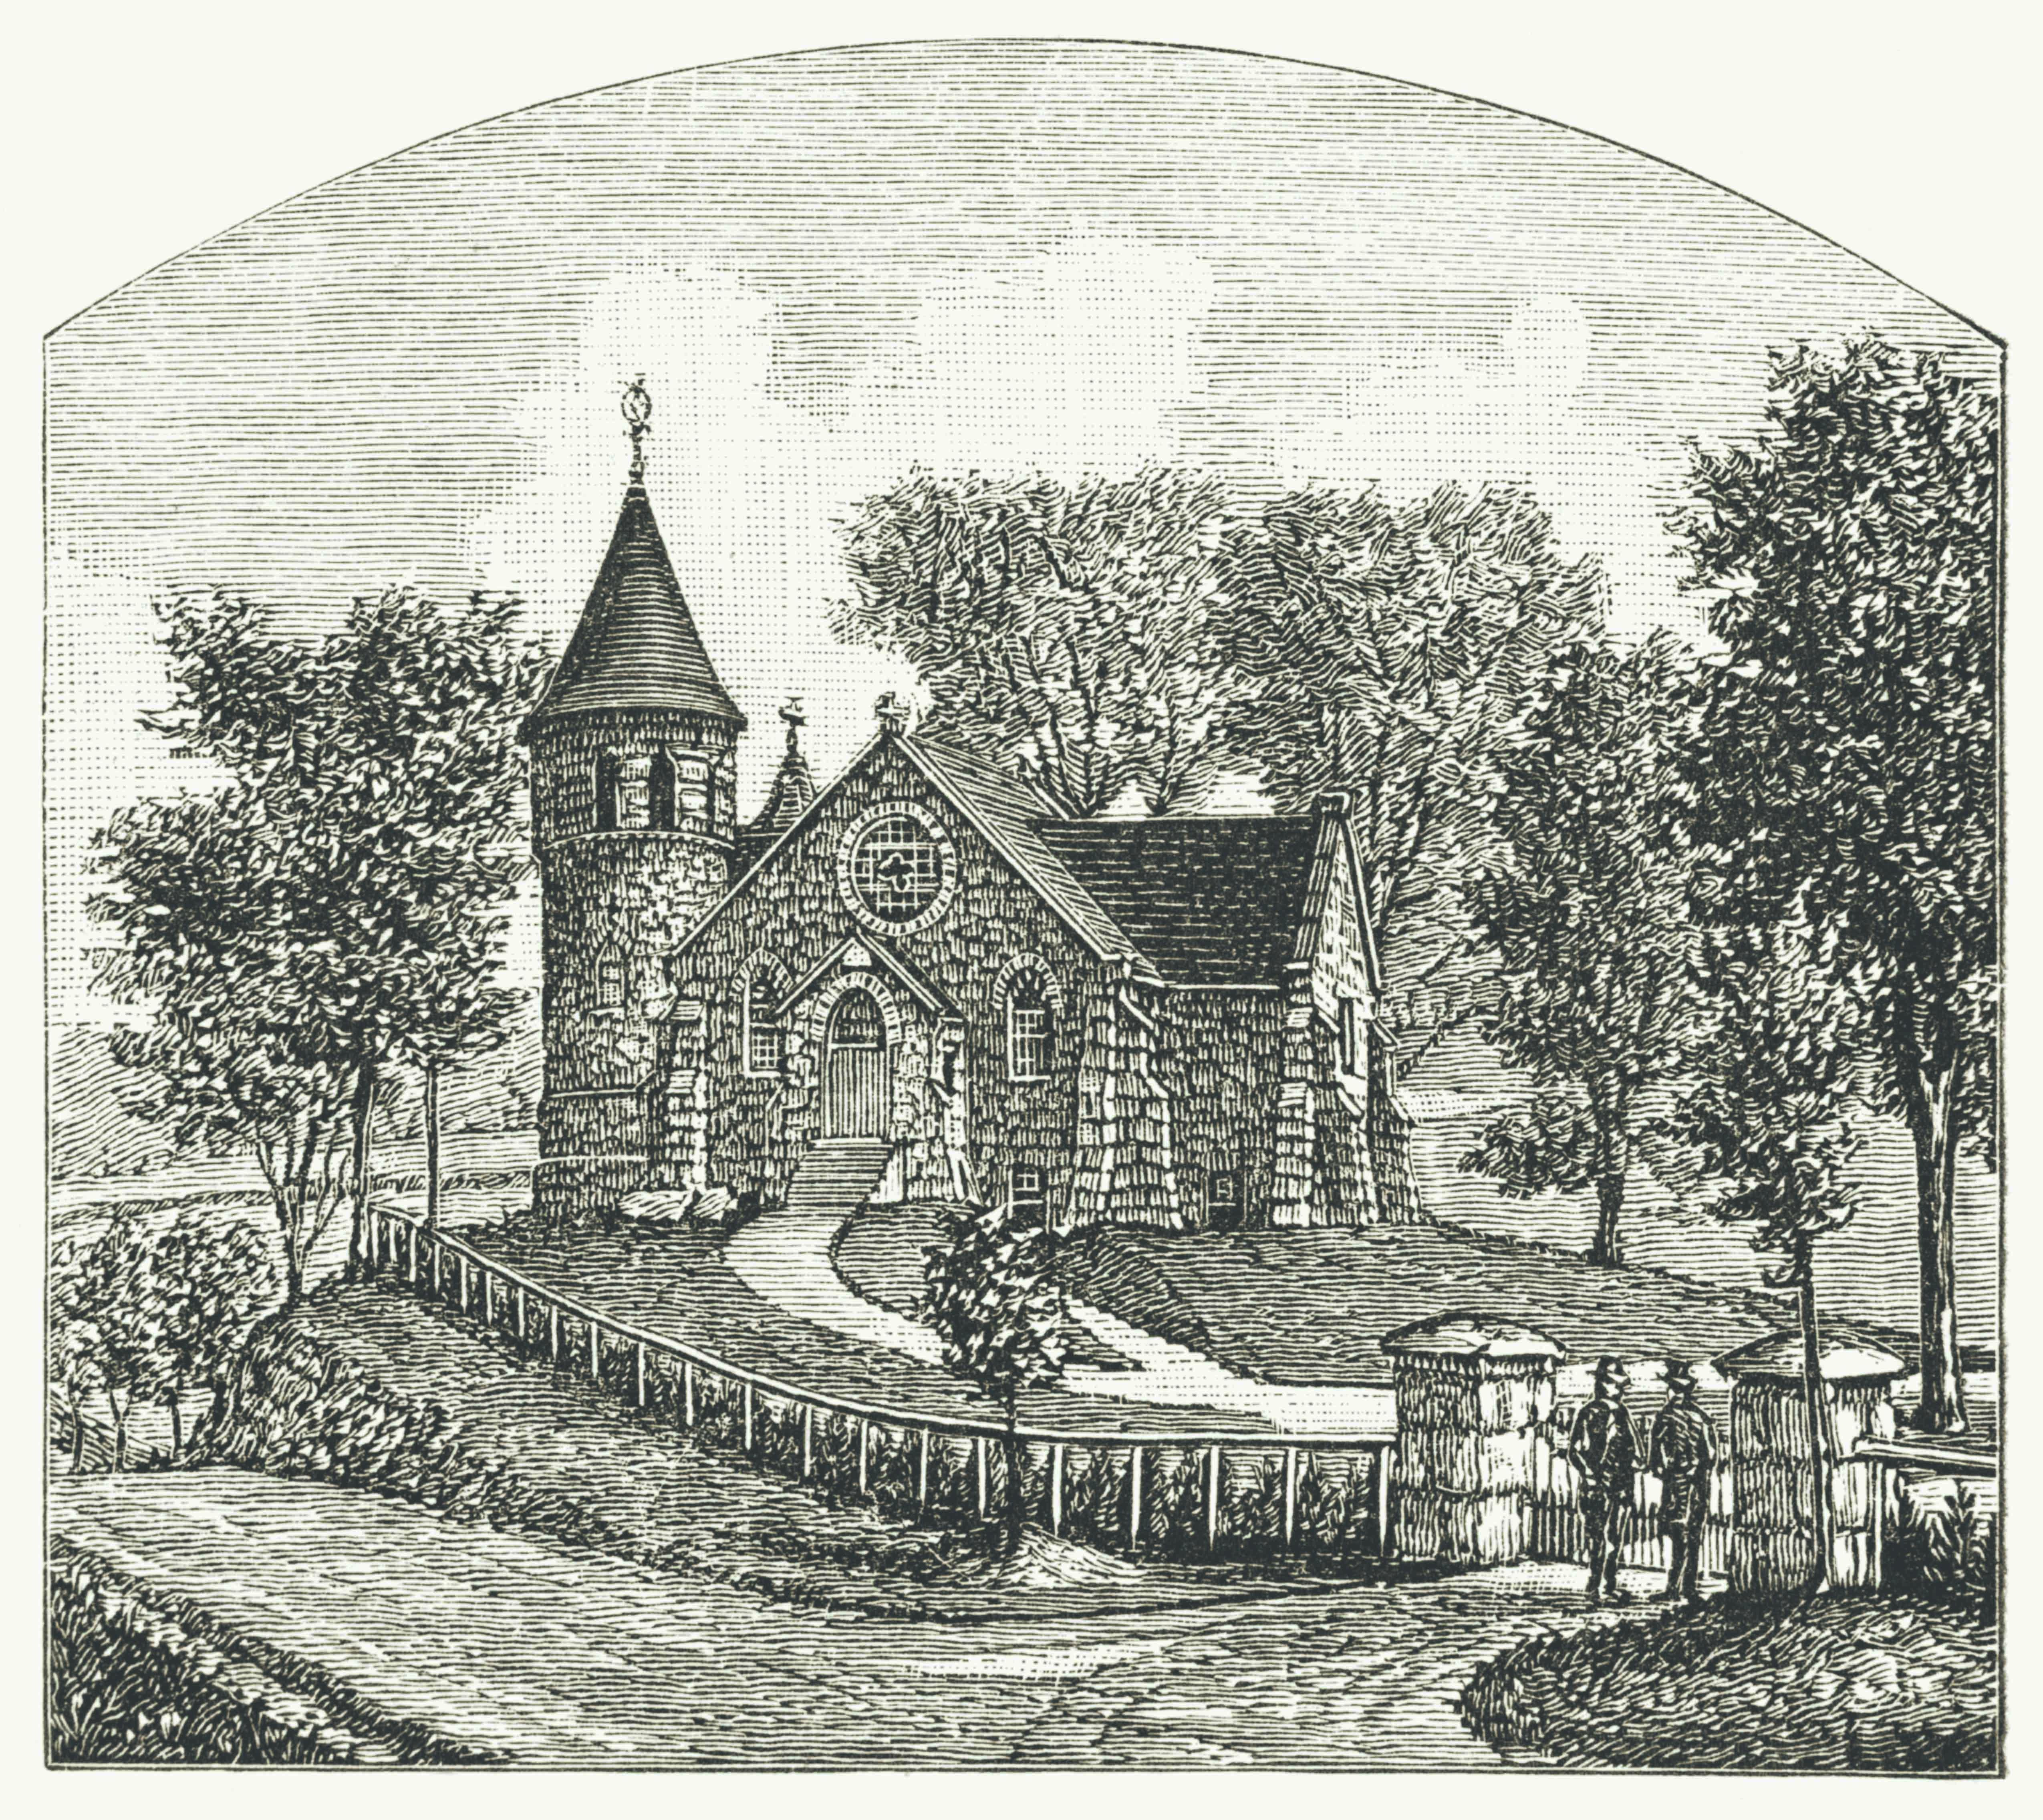 The Worthington Memorial Chapel (now St. Joseph of Arimathea Church) in 1886.